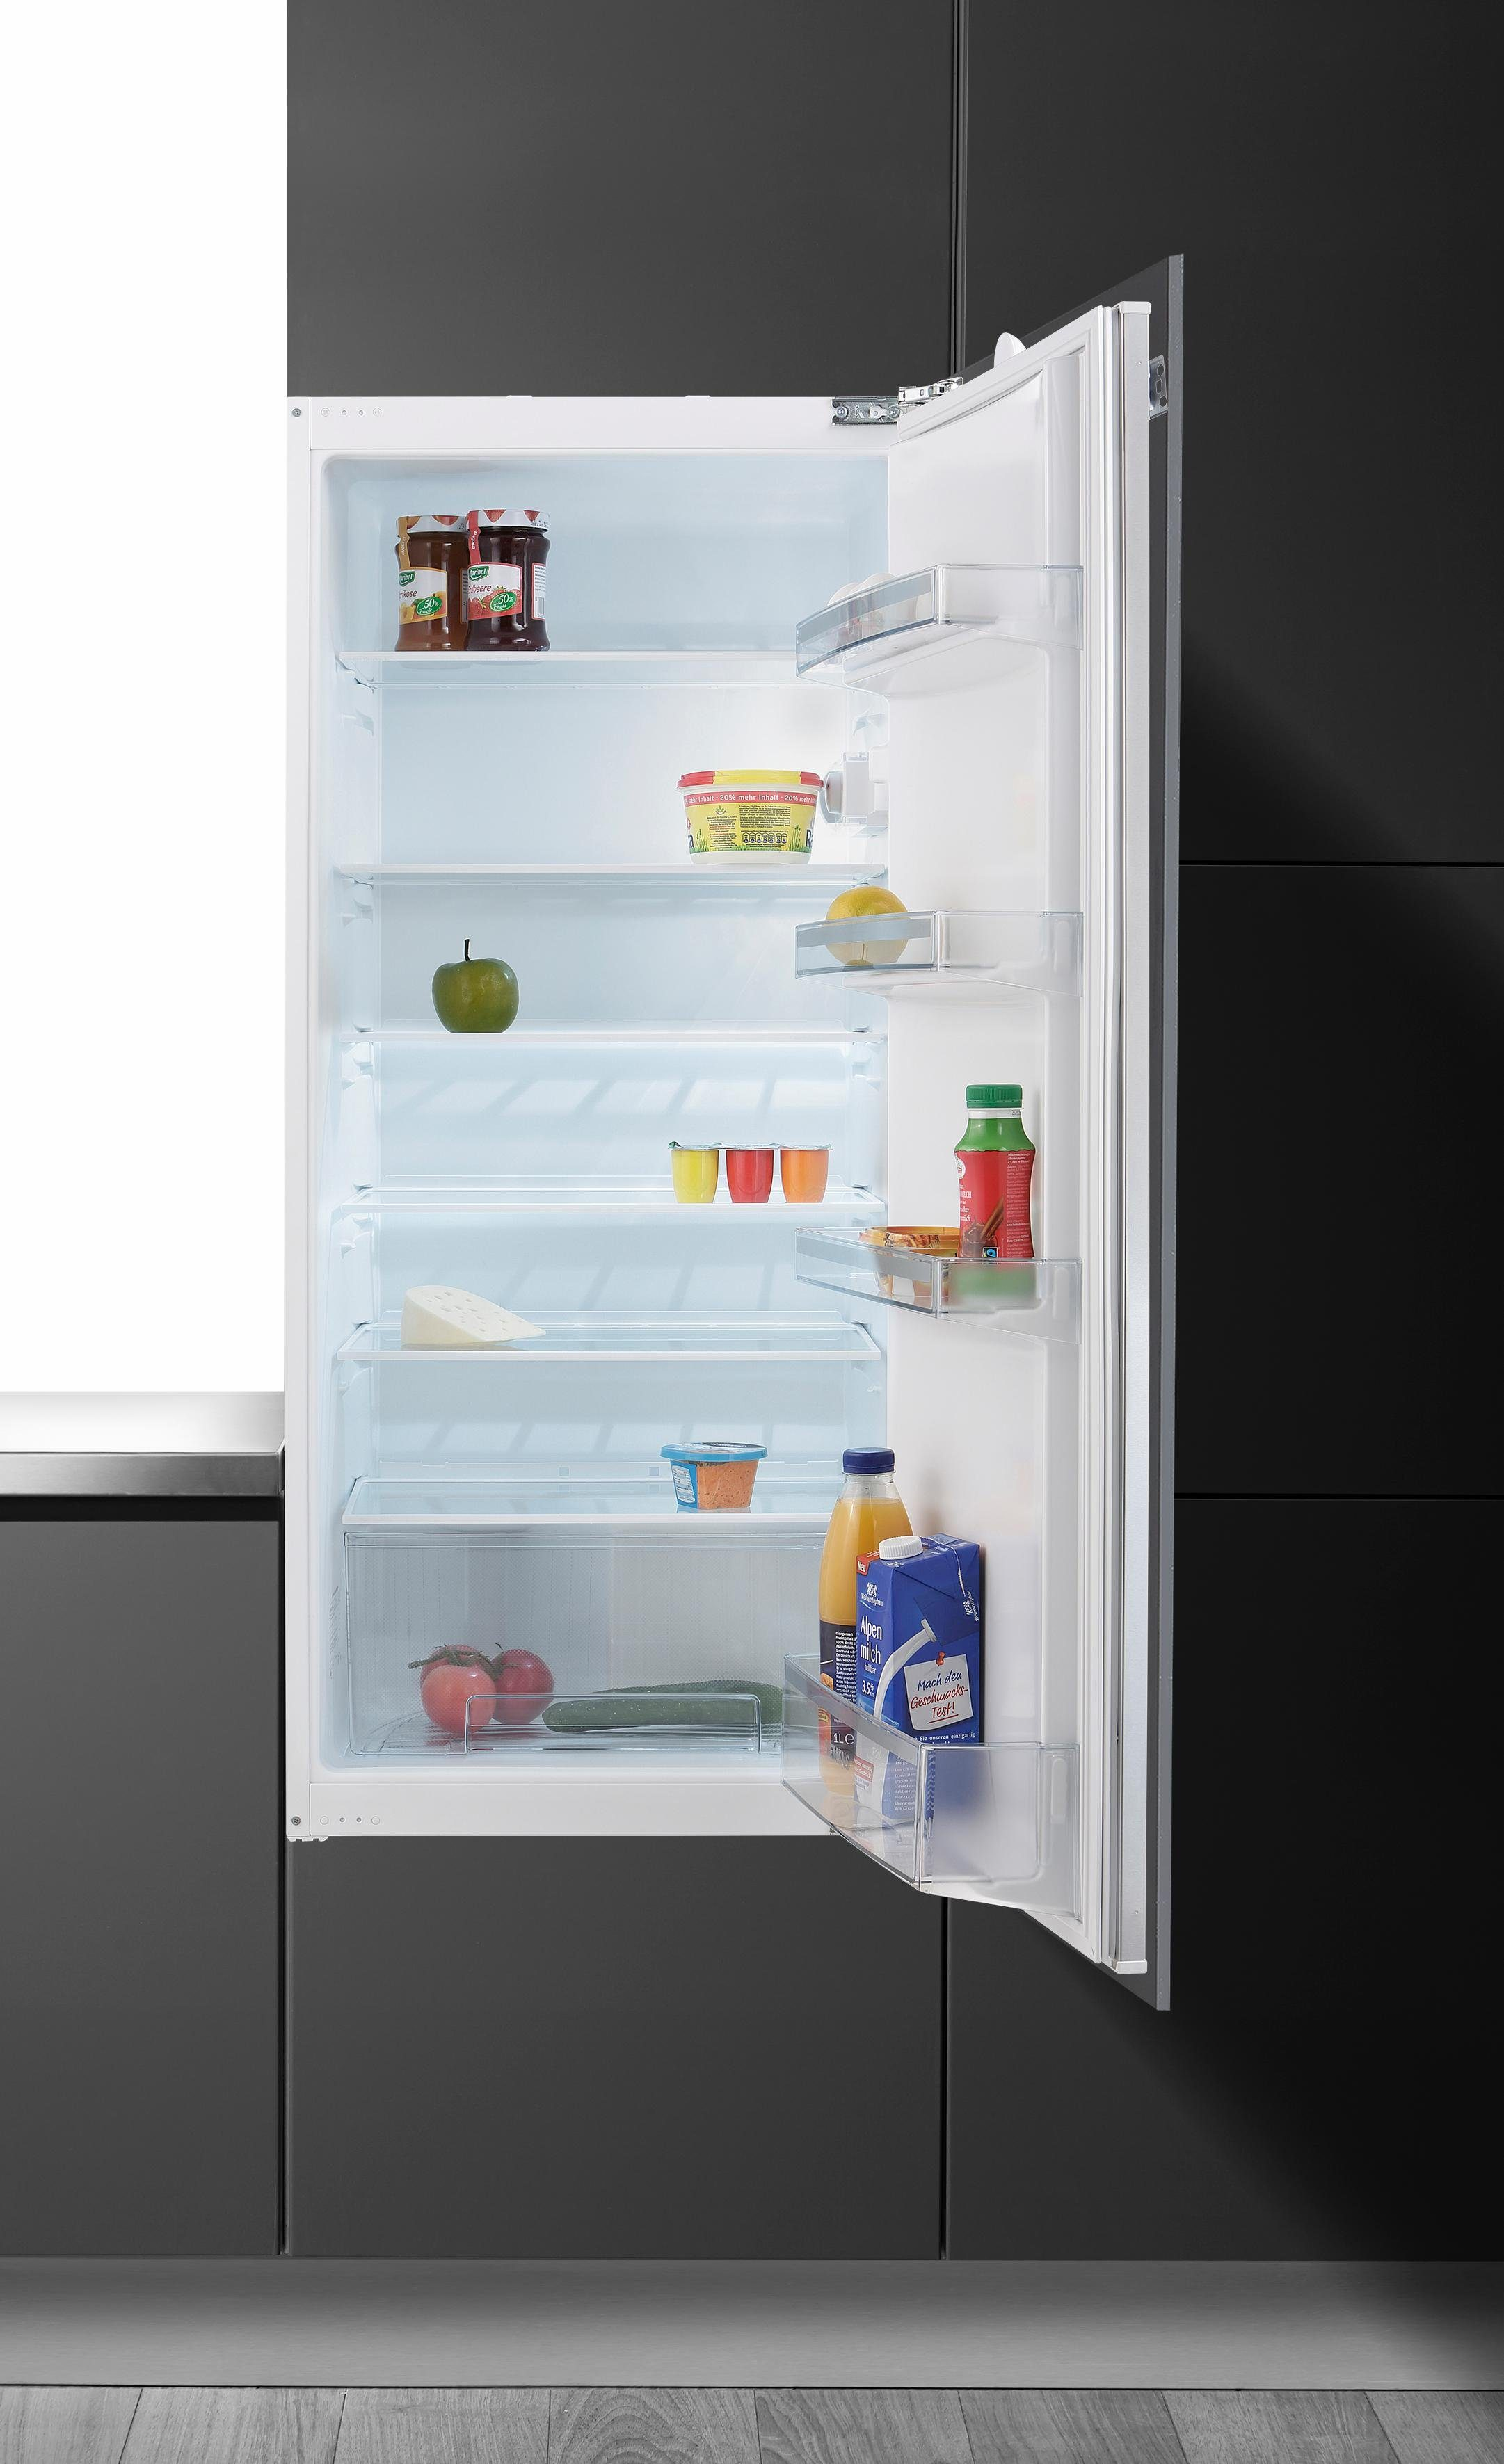 Siemens integrierbarer Einbau-Kühlschrank KI24RV52, A+, 122,5 cm